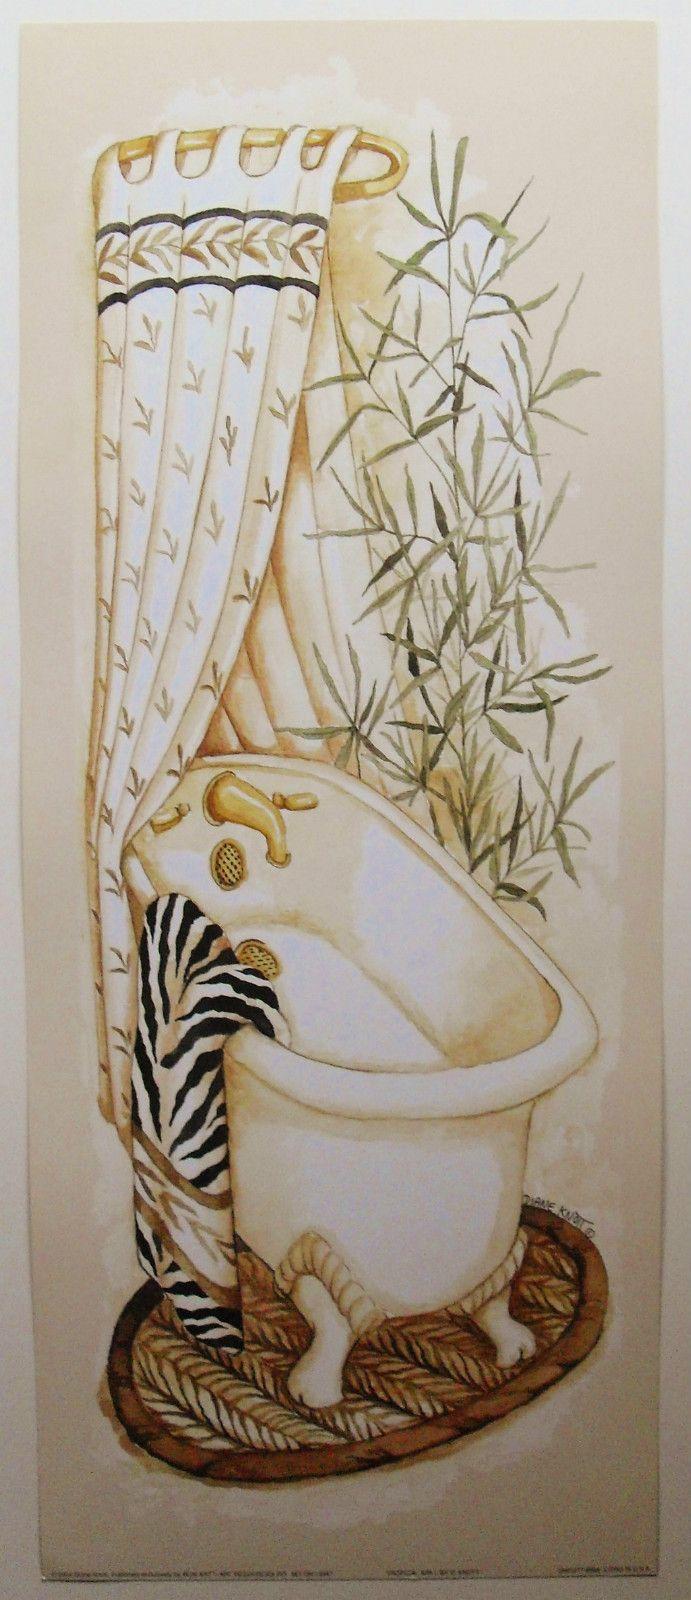 In the bathroom while taking a shower or a well deserved bubble bath - Home Decor Bathroom Bathtub Art Print Tropical Spa I By Diane Knott